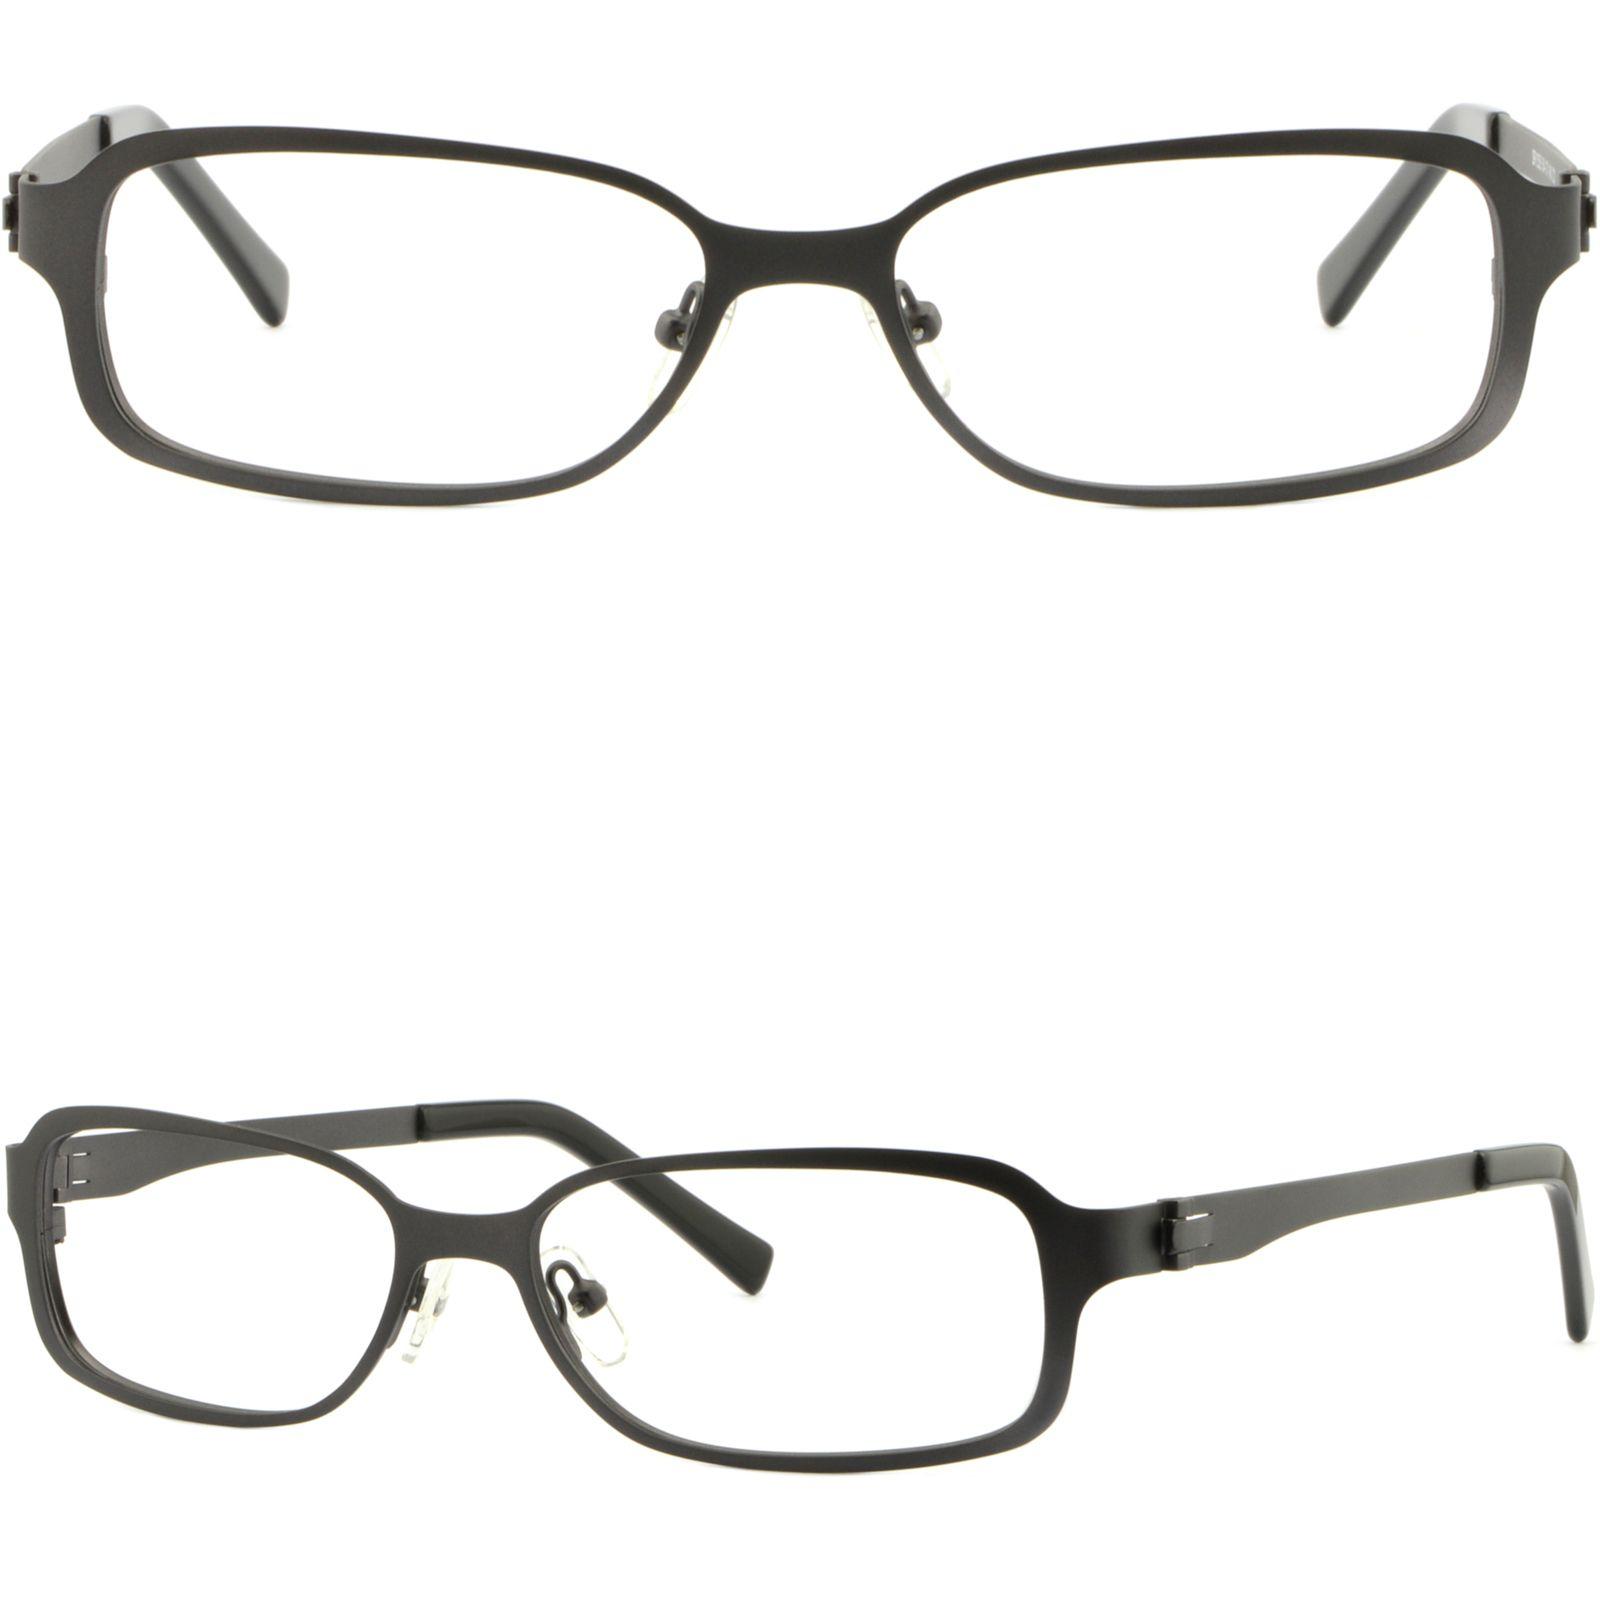 f553338a0c Rectangular Men Women Metal Frame Prescription Glasses Sunglasses Dark Grey  Gray Glasses Frame Online with  35.87 Piece on Aceglasses s Store